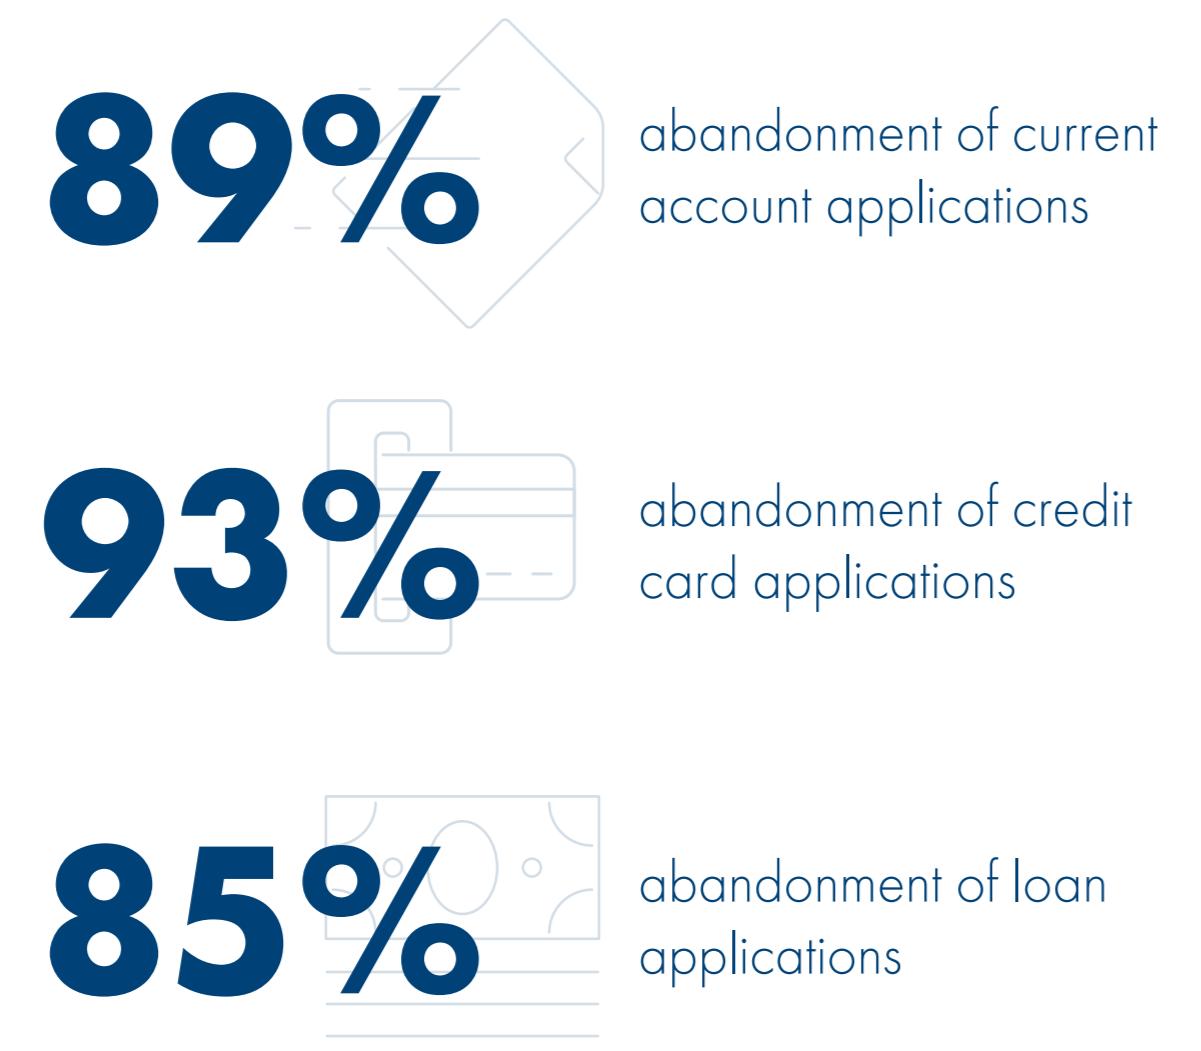 Digital banking research. Source: Temenos